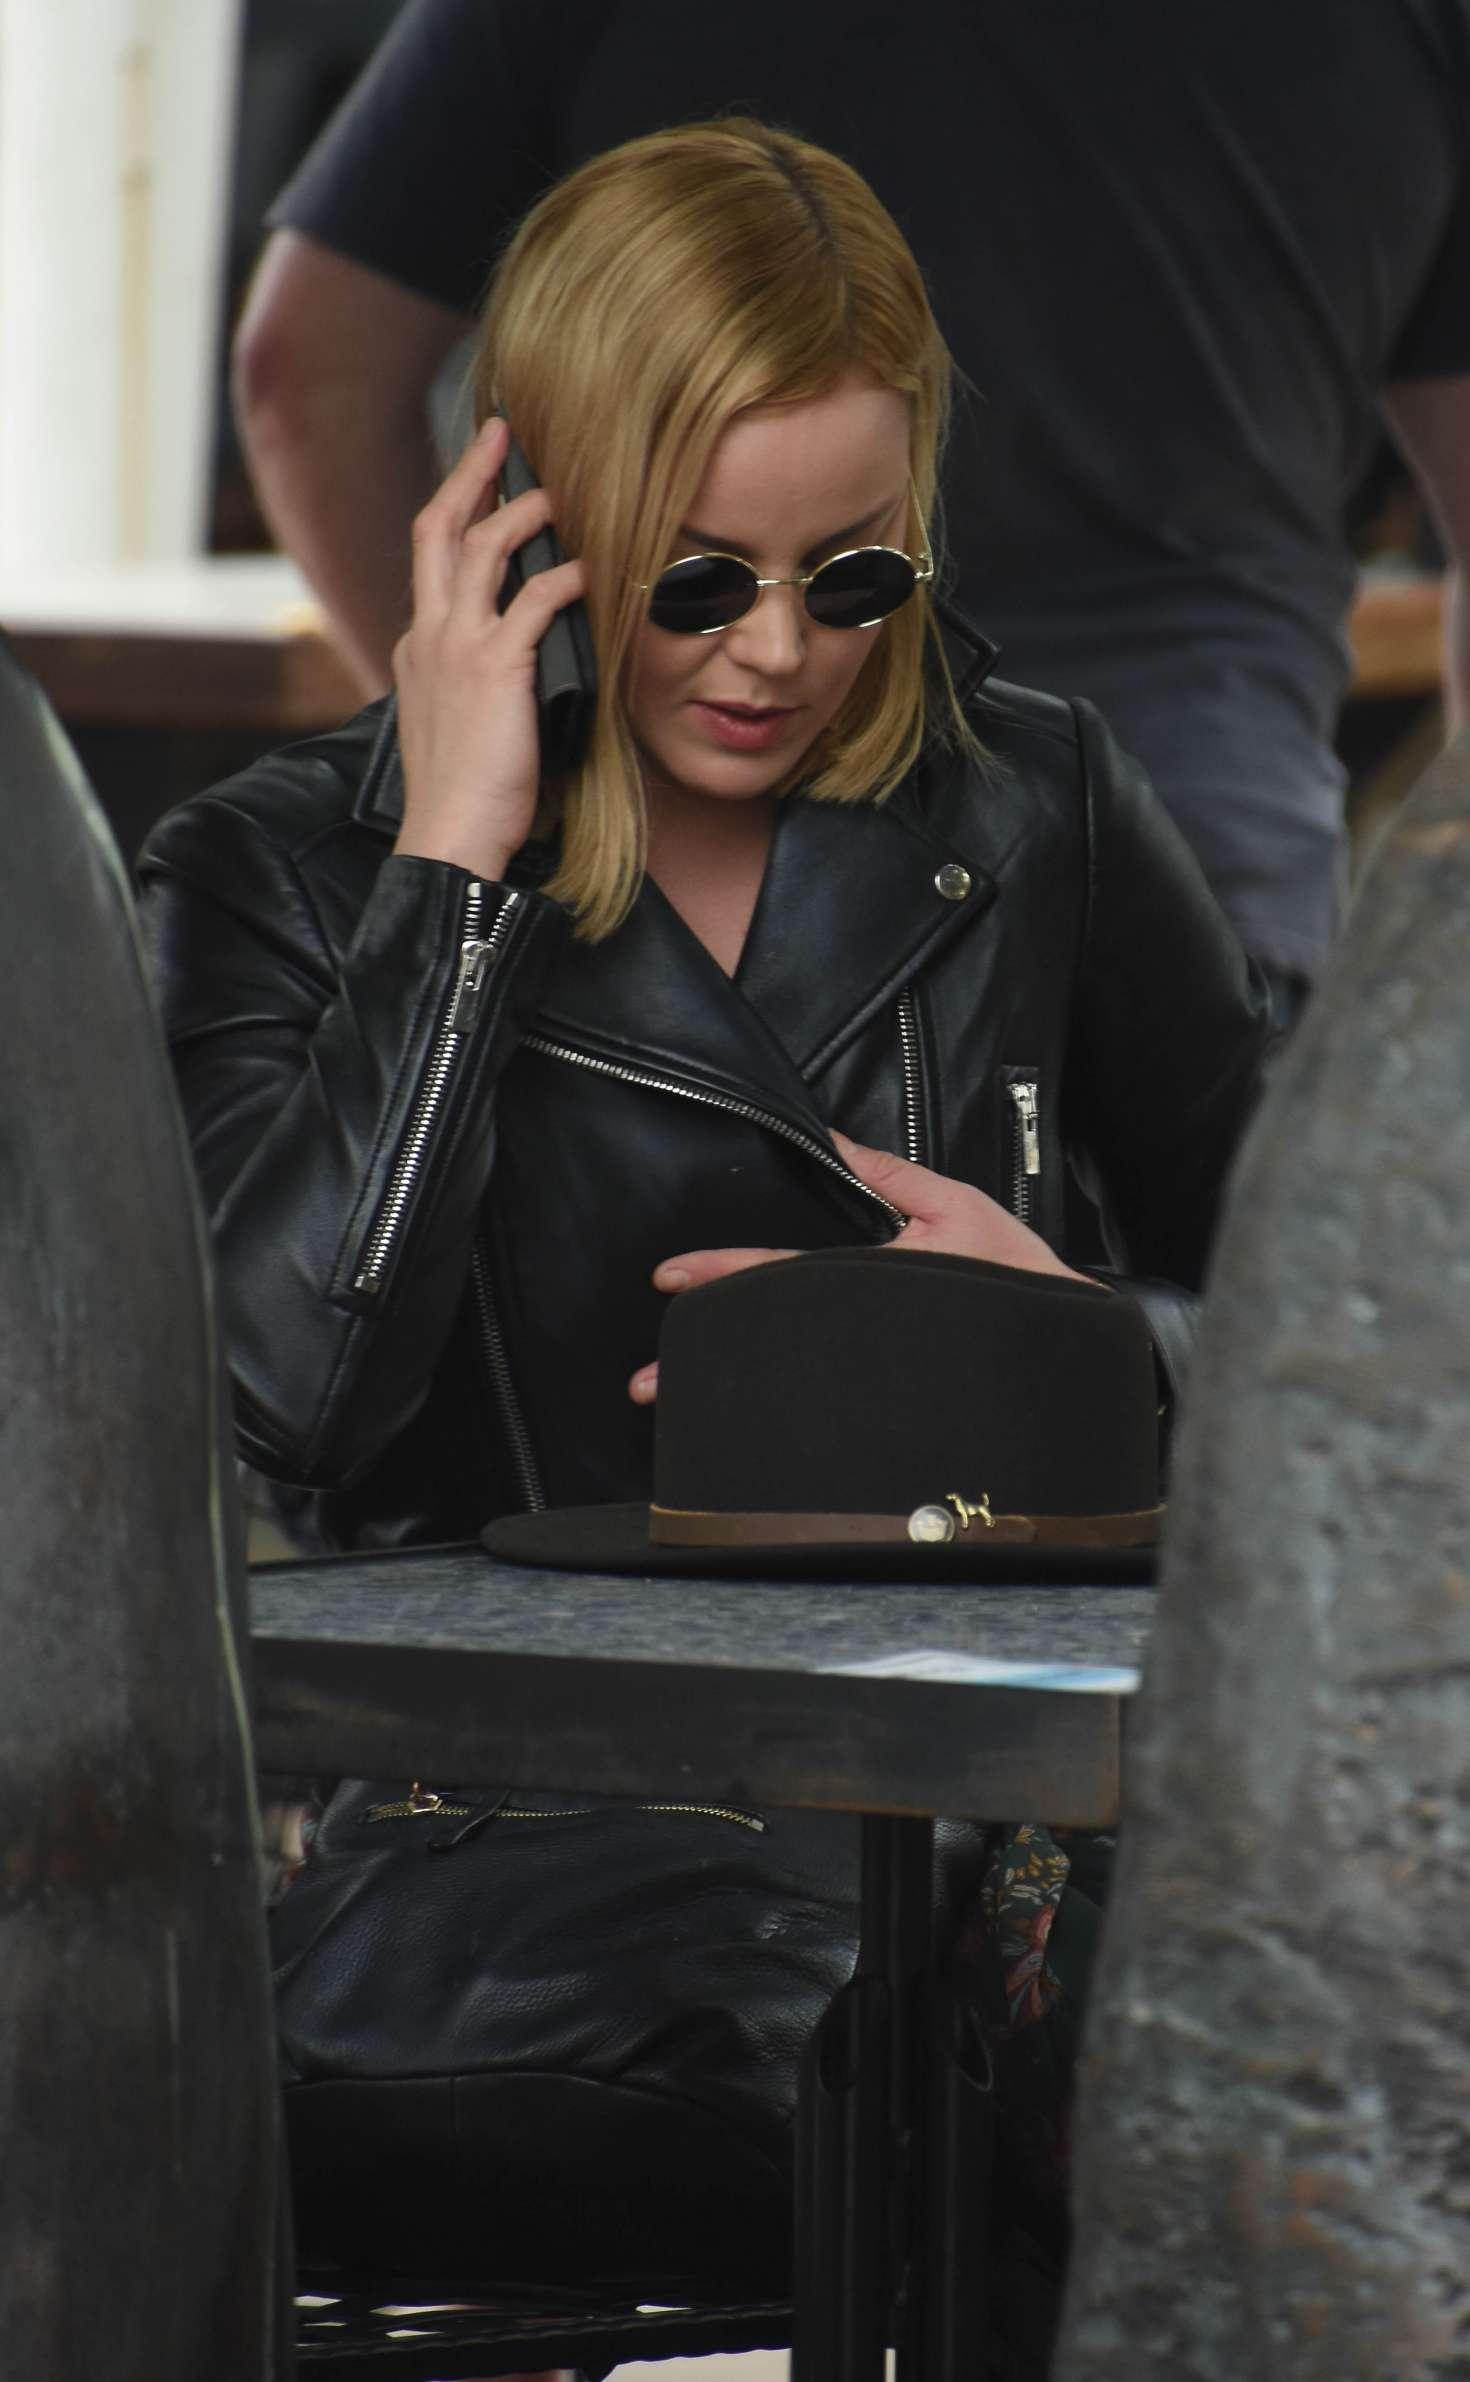 Abbie Cornish 2016 : Abbie Cornish in Long Dress arrives in Sydney -04